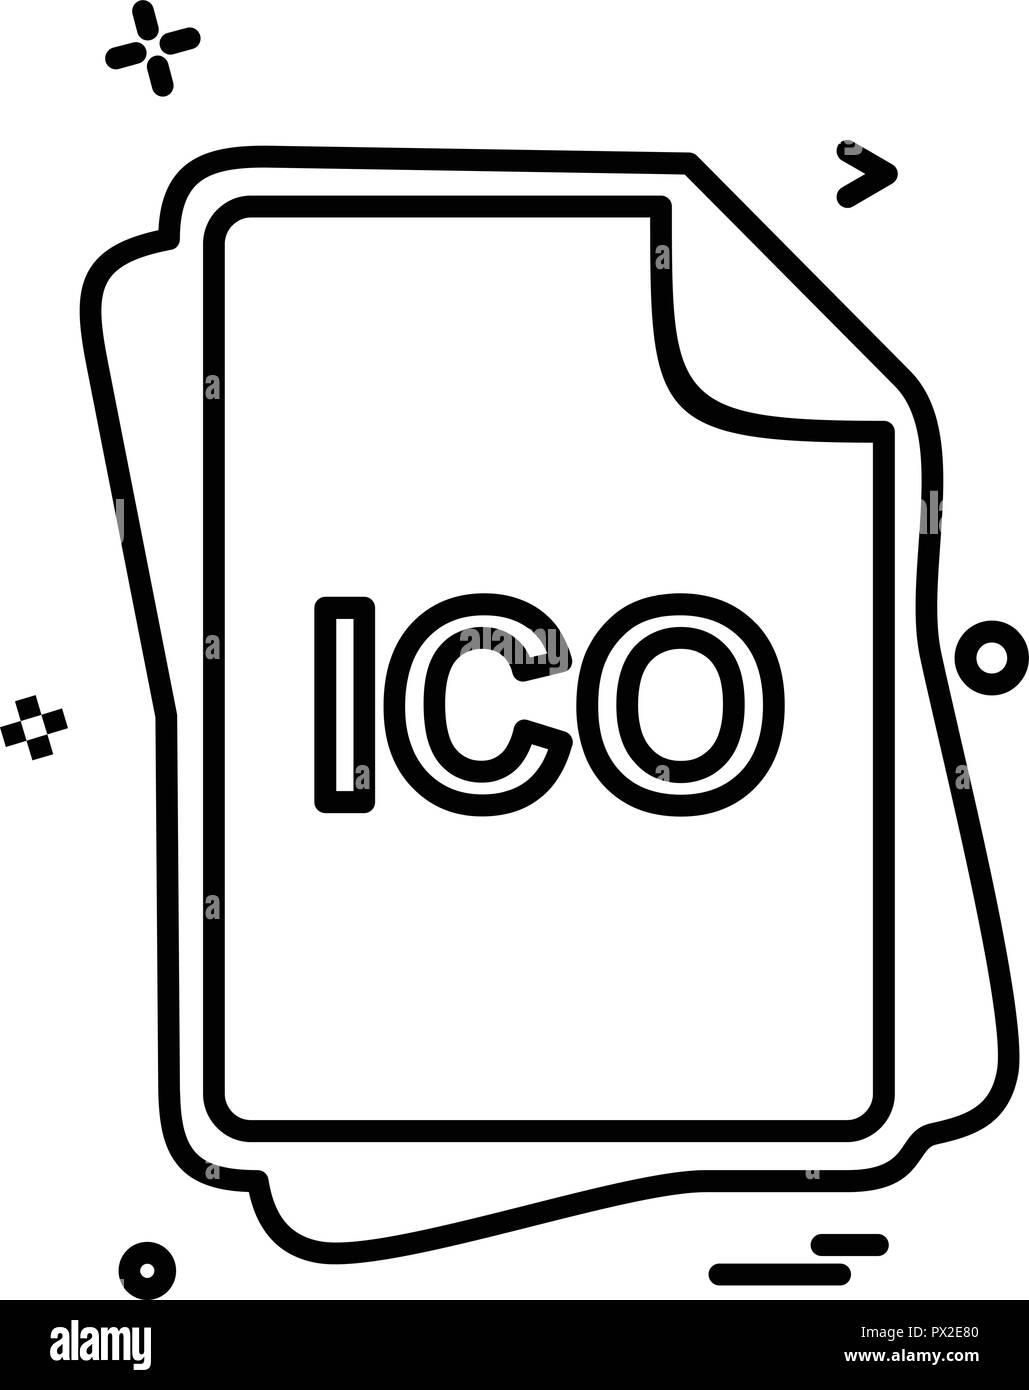 ICO file type icon design vector Stock Vector Art & Illustration